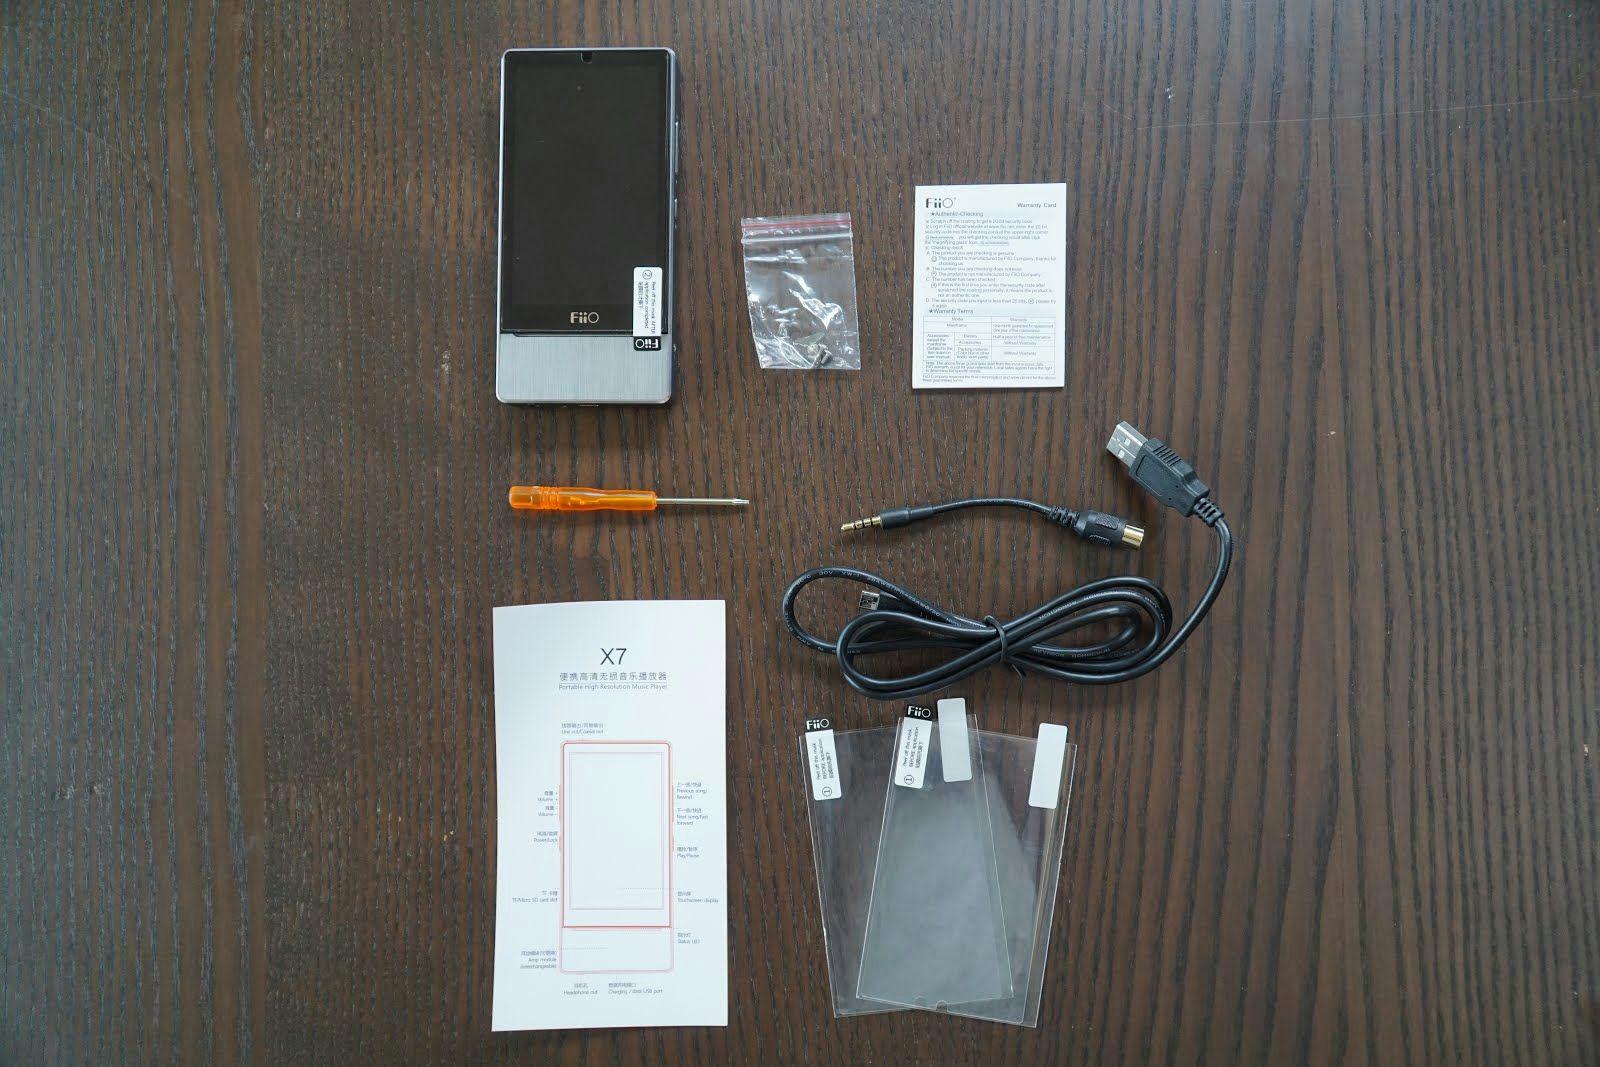 Review: FiiO X7 Digital Audio Player